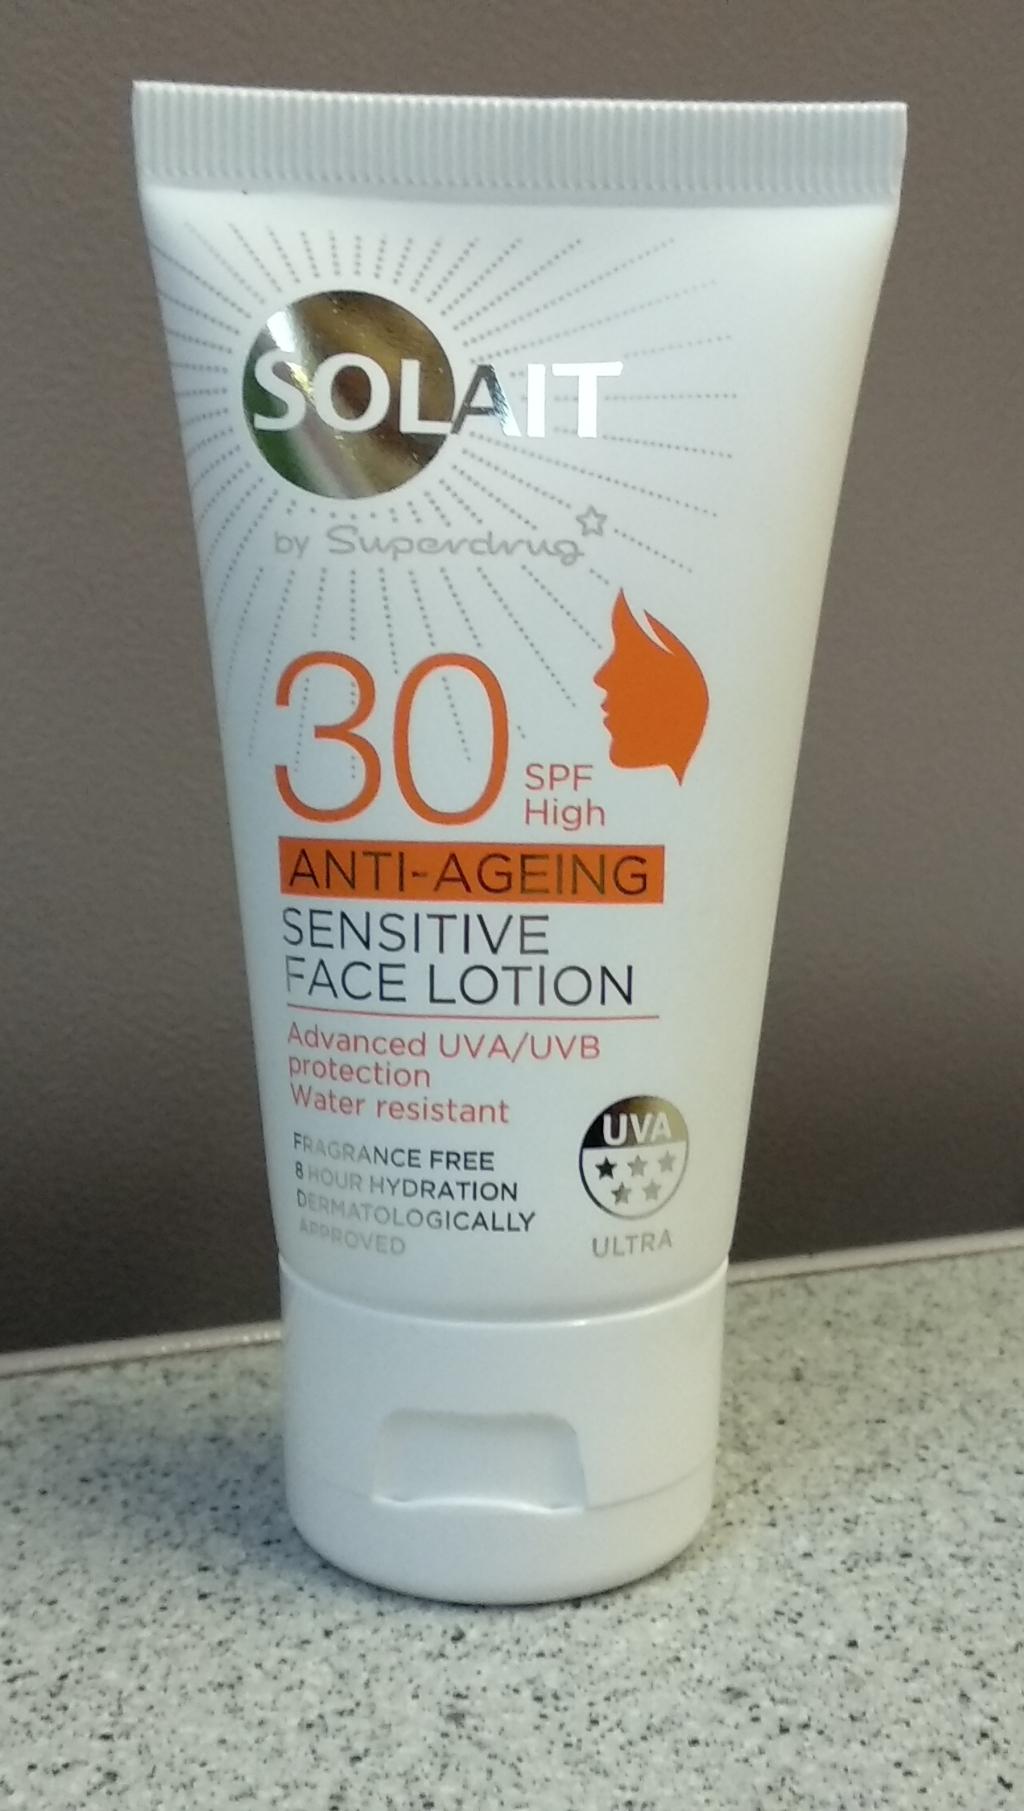 Solait Spf30 Anti-Ageing Sensitive Face Lotion